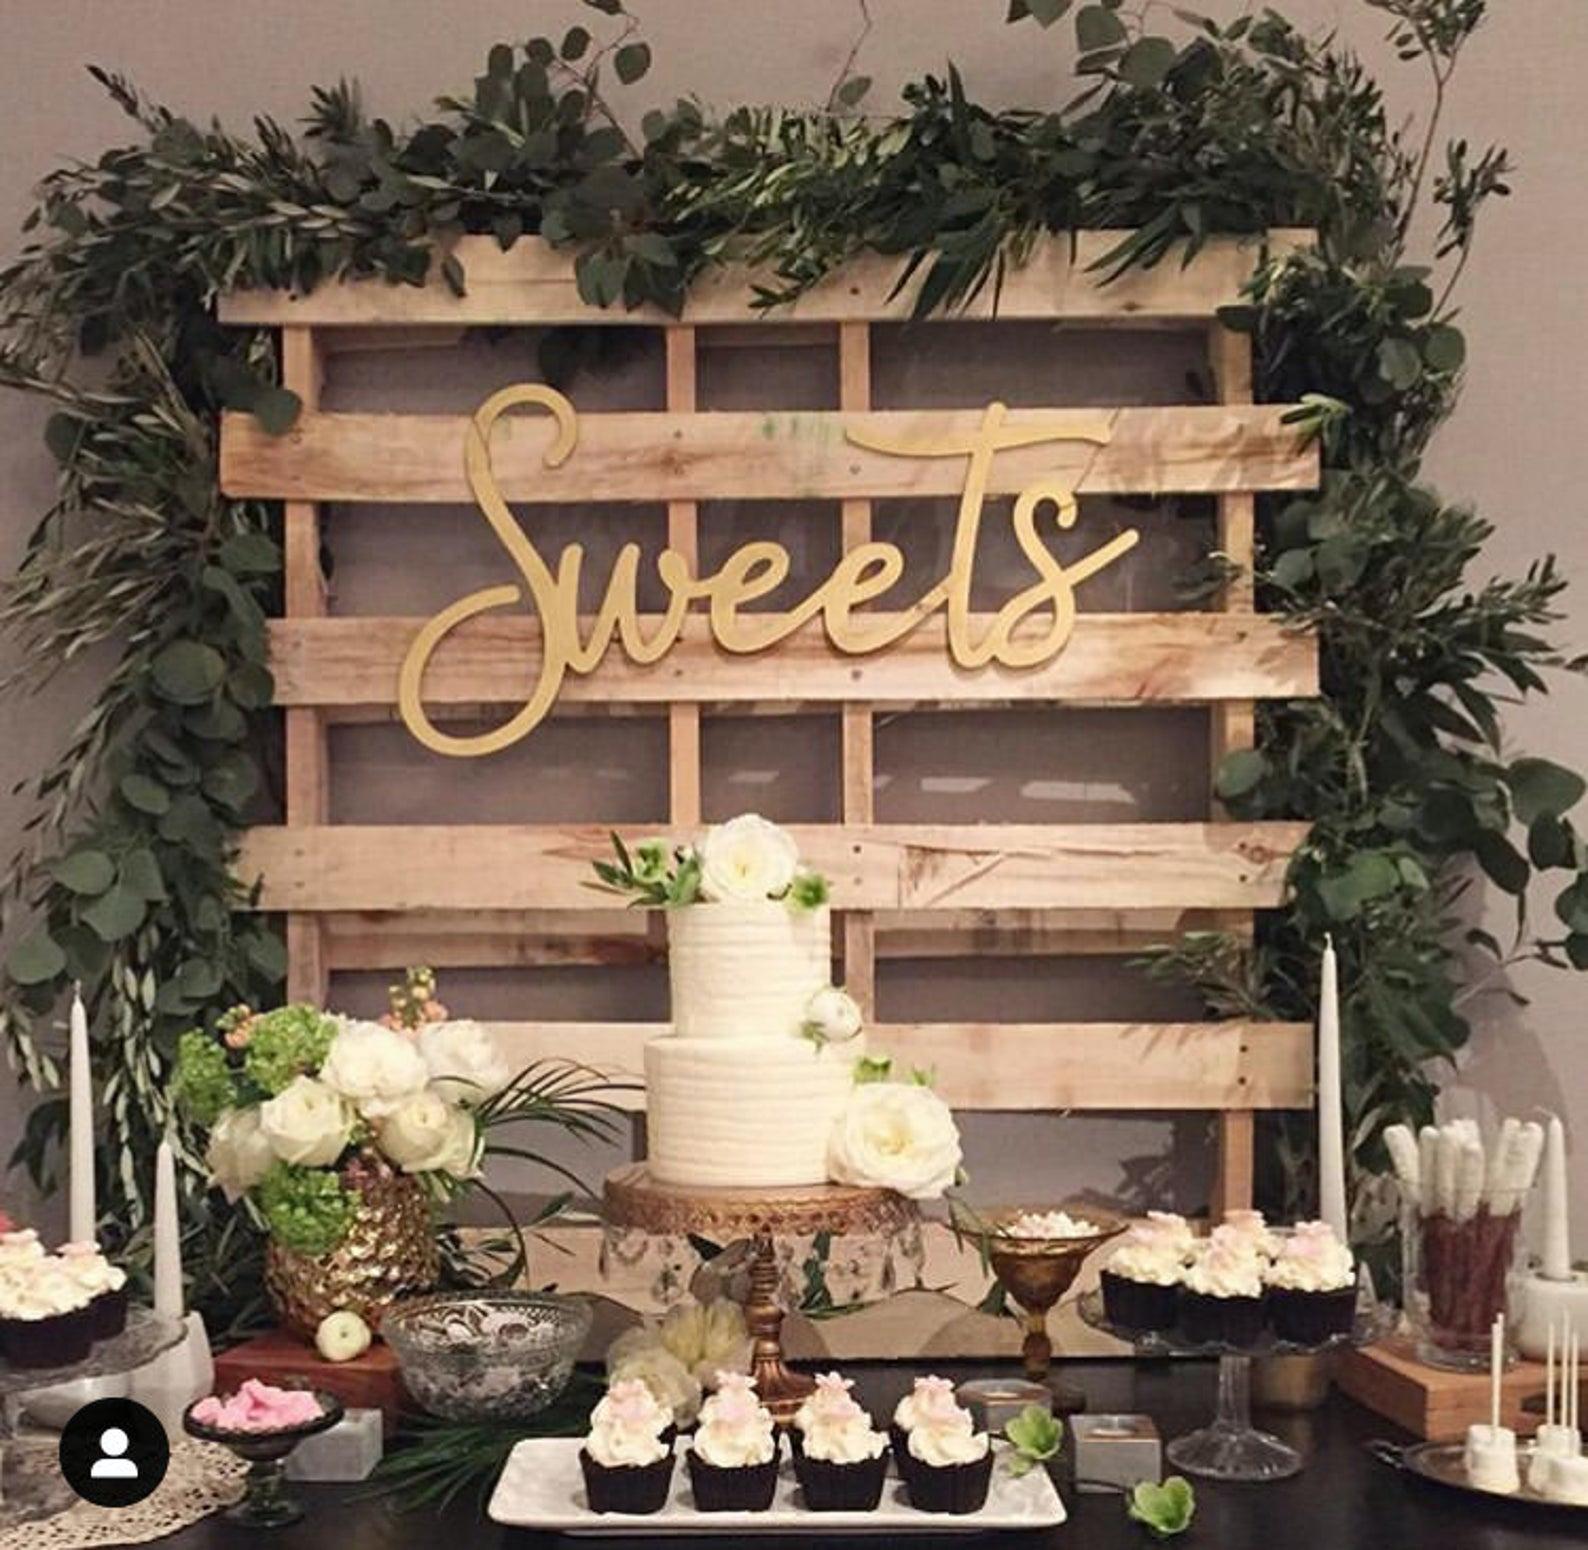 Sweets Sign Wood Wedding Decor Wedding Signs Wedding Decor Wedding Signage Dessert Sign Dessert Table Sign In 2020 Wedding Desert Table Wedding Shower Desserts Wedding Cake Table